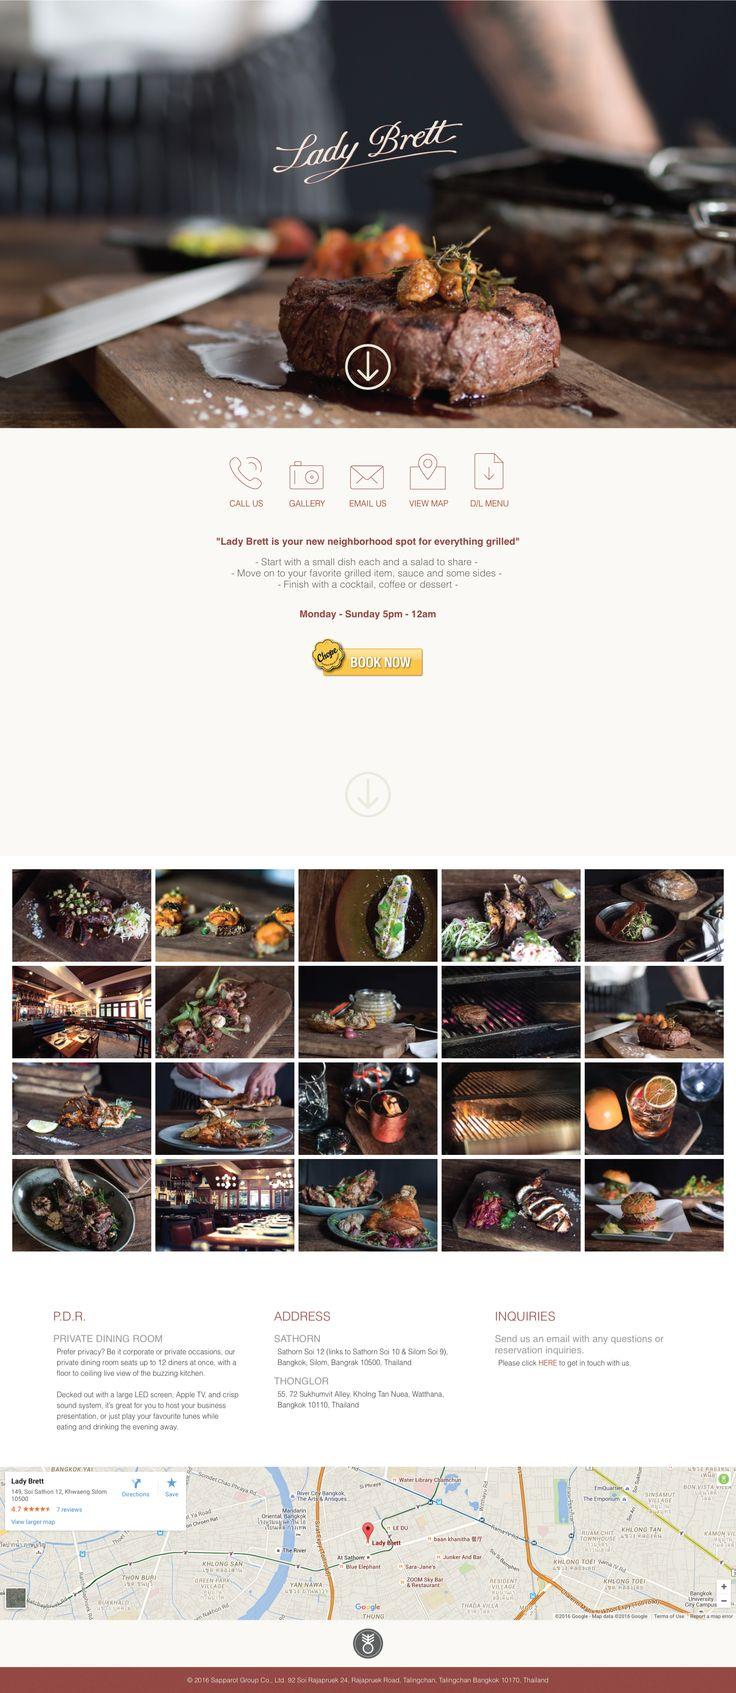 Lady Brett Tavern's website.  Created By @danjoso